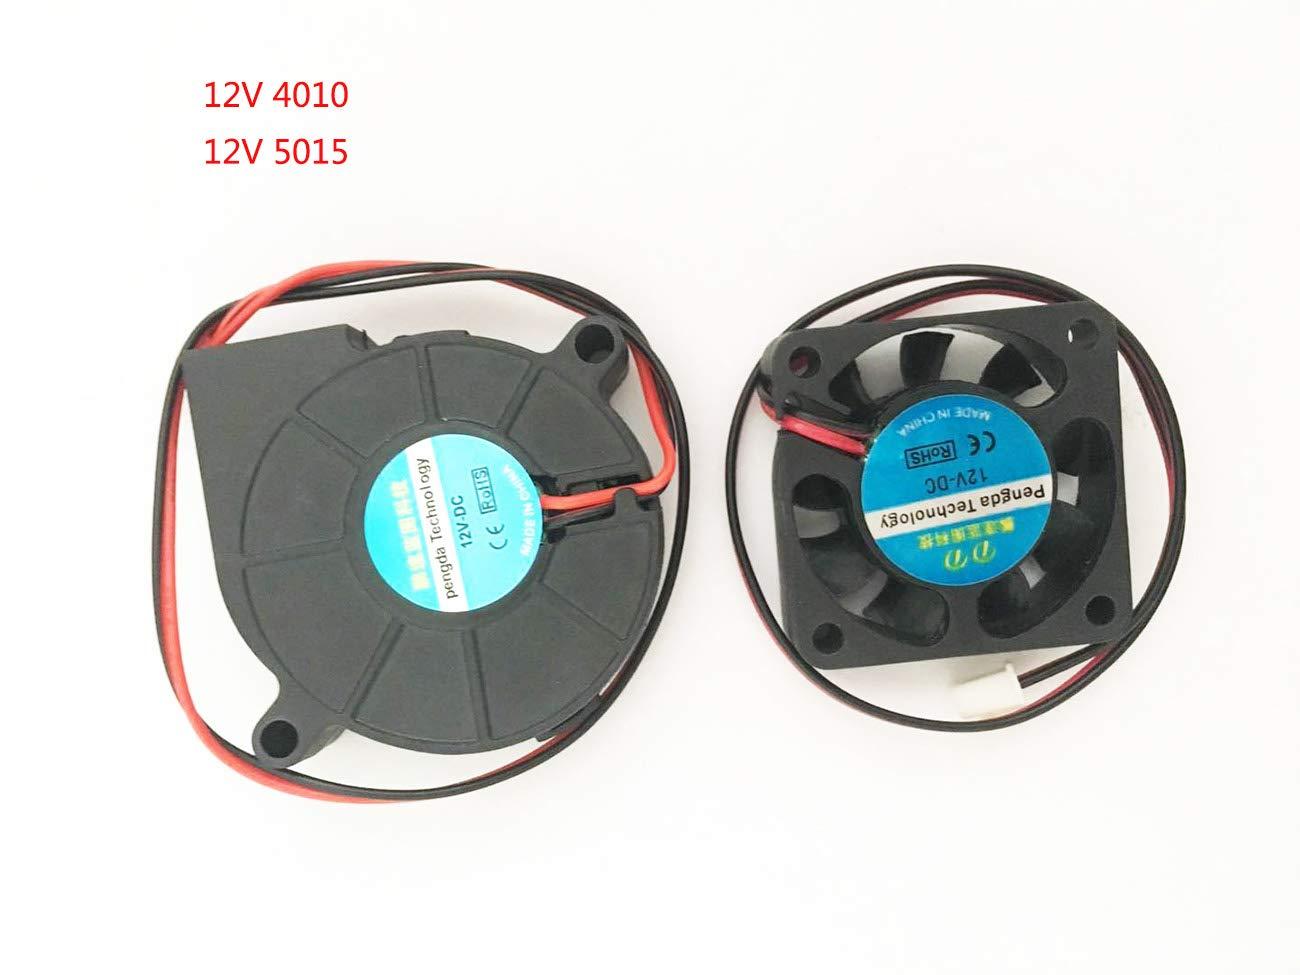 3D Printer Fan Blower Fan DC 12V 40x10 50x15 Extruder Coo...